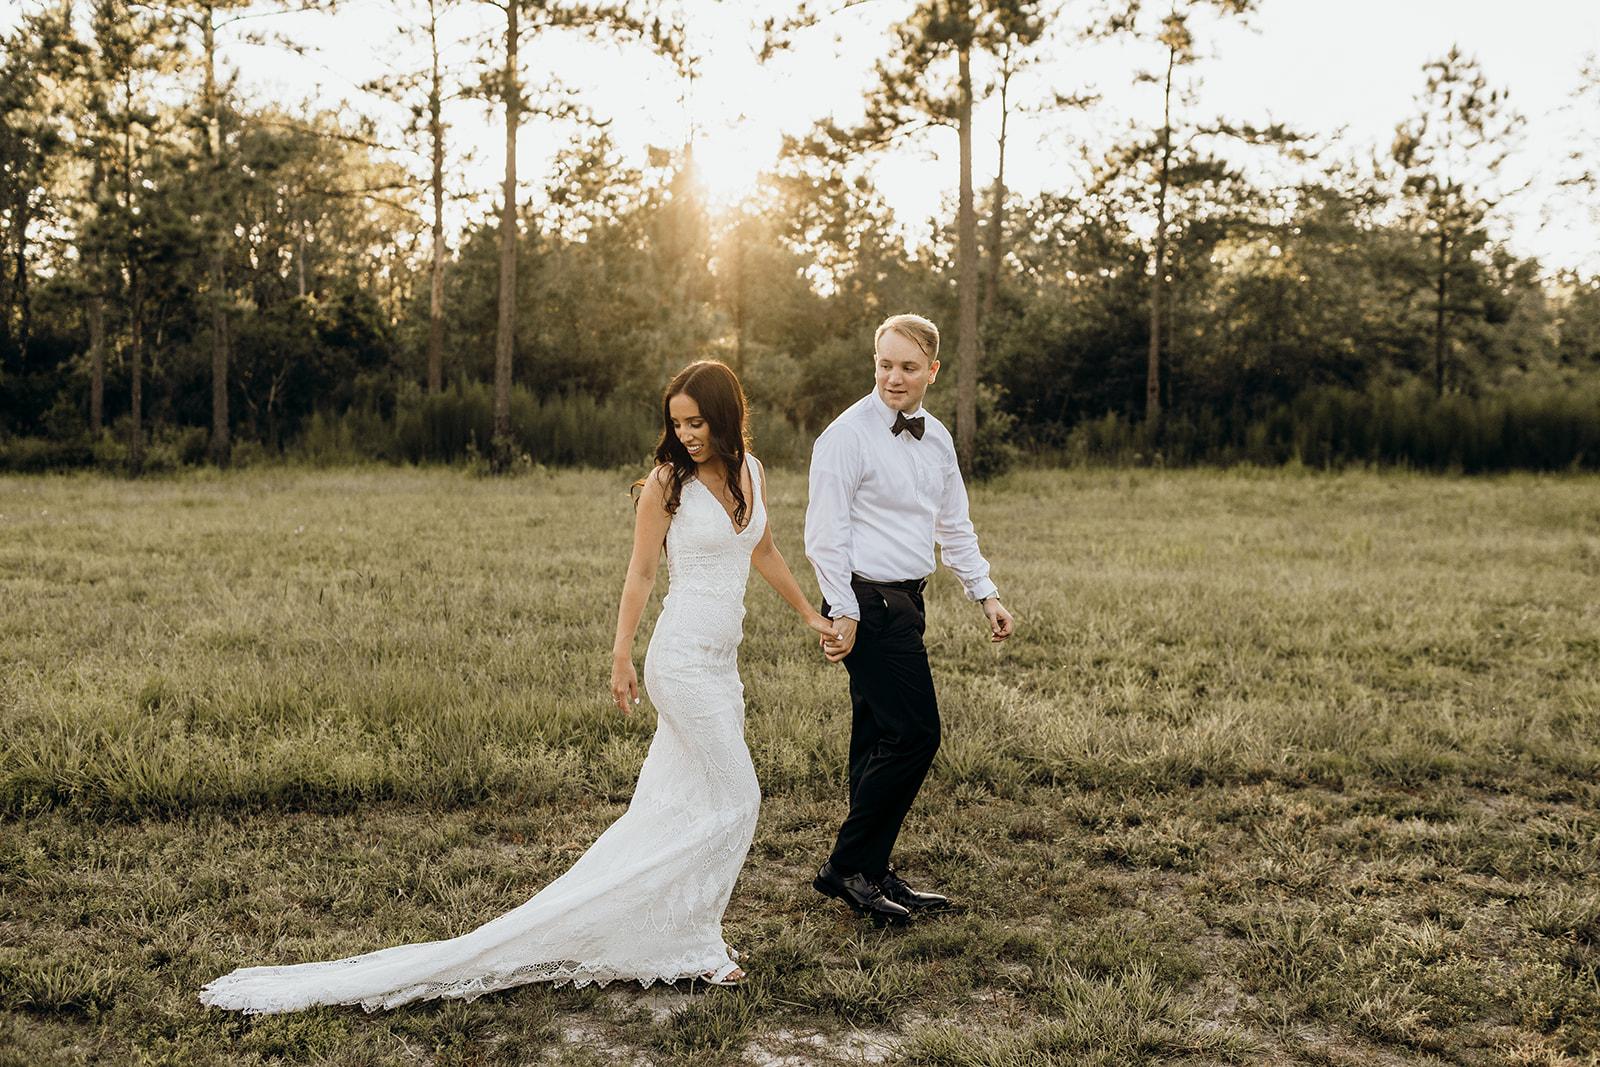 Casey-Josh-Pearl-In-The-Wild-Tallahassee-Wedding-167_websize.jpg